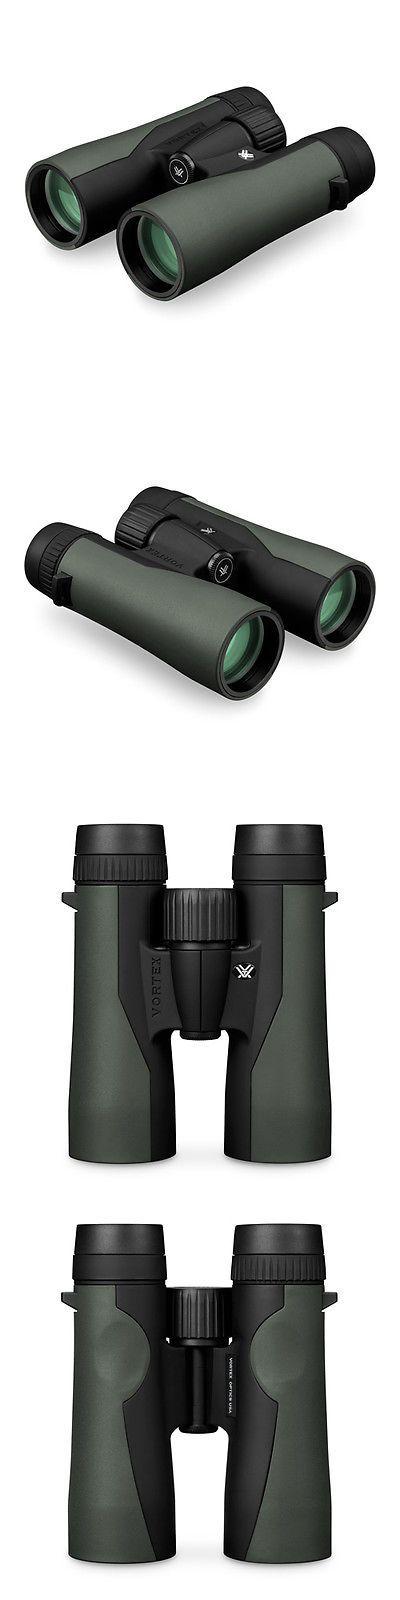 Hunting Binoculars 31711: Vortex Crossfire 10X42mm Binoculars (Cf-4302) BUY IT NOW ONLY: $151.82